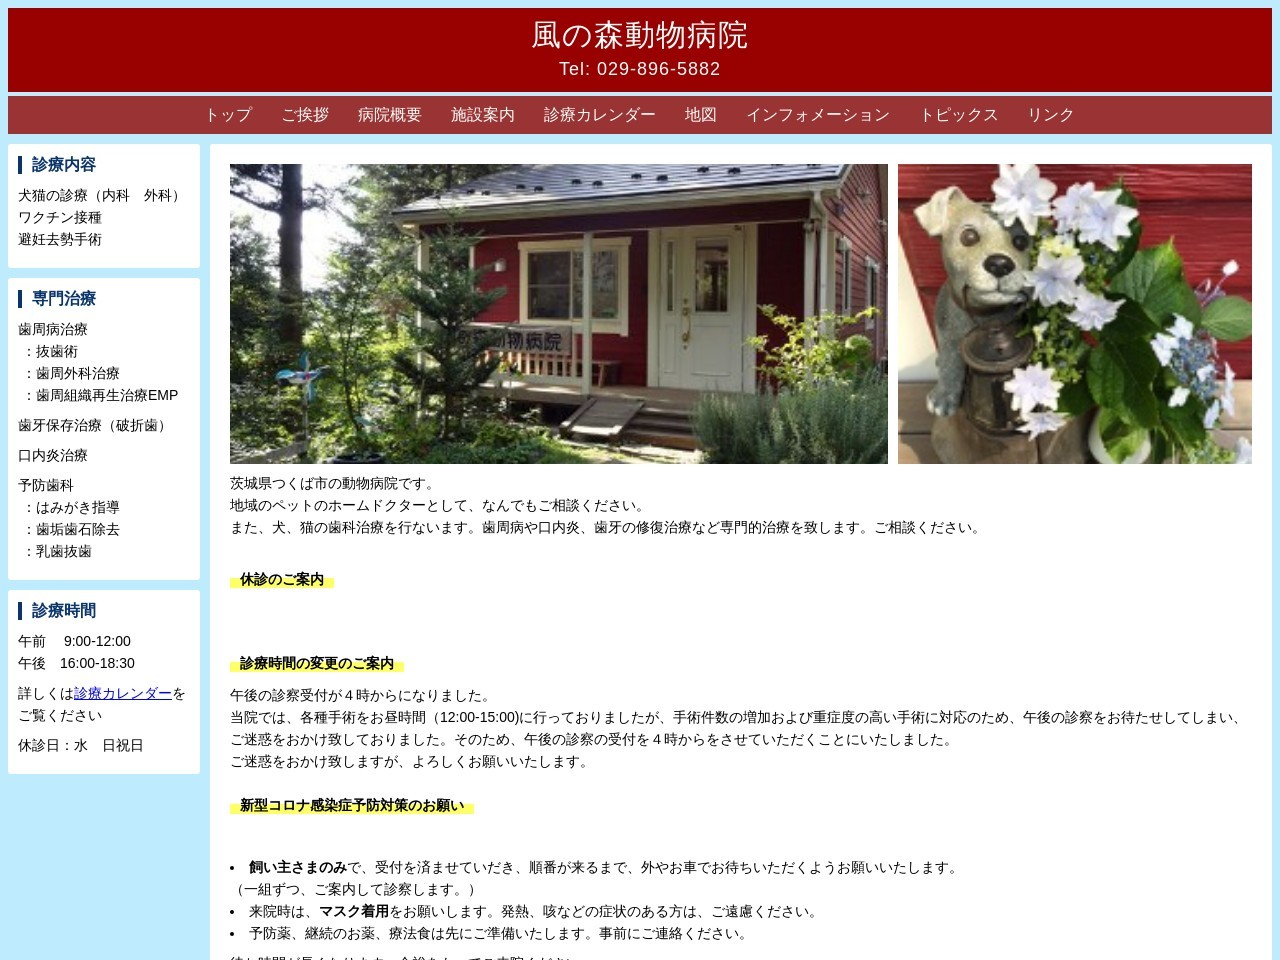 http://kazenomori-ah.jp